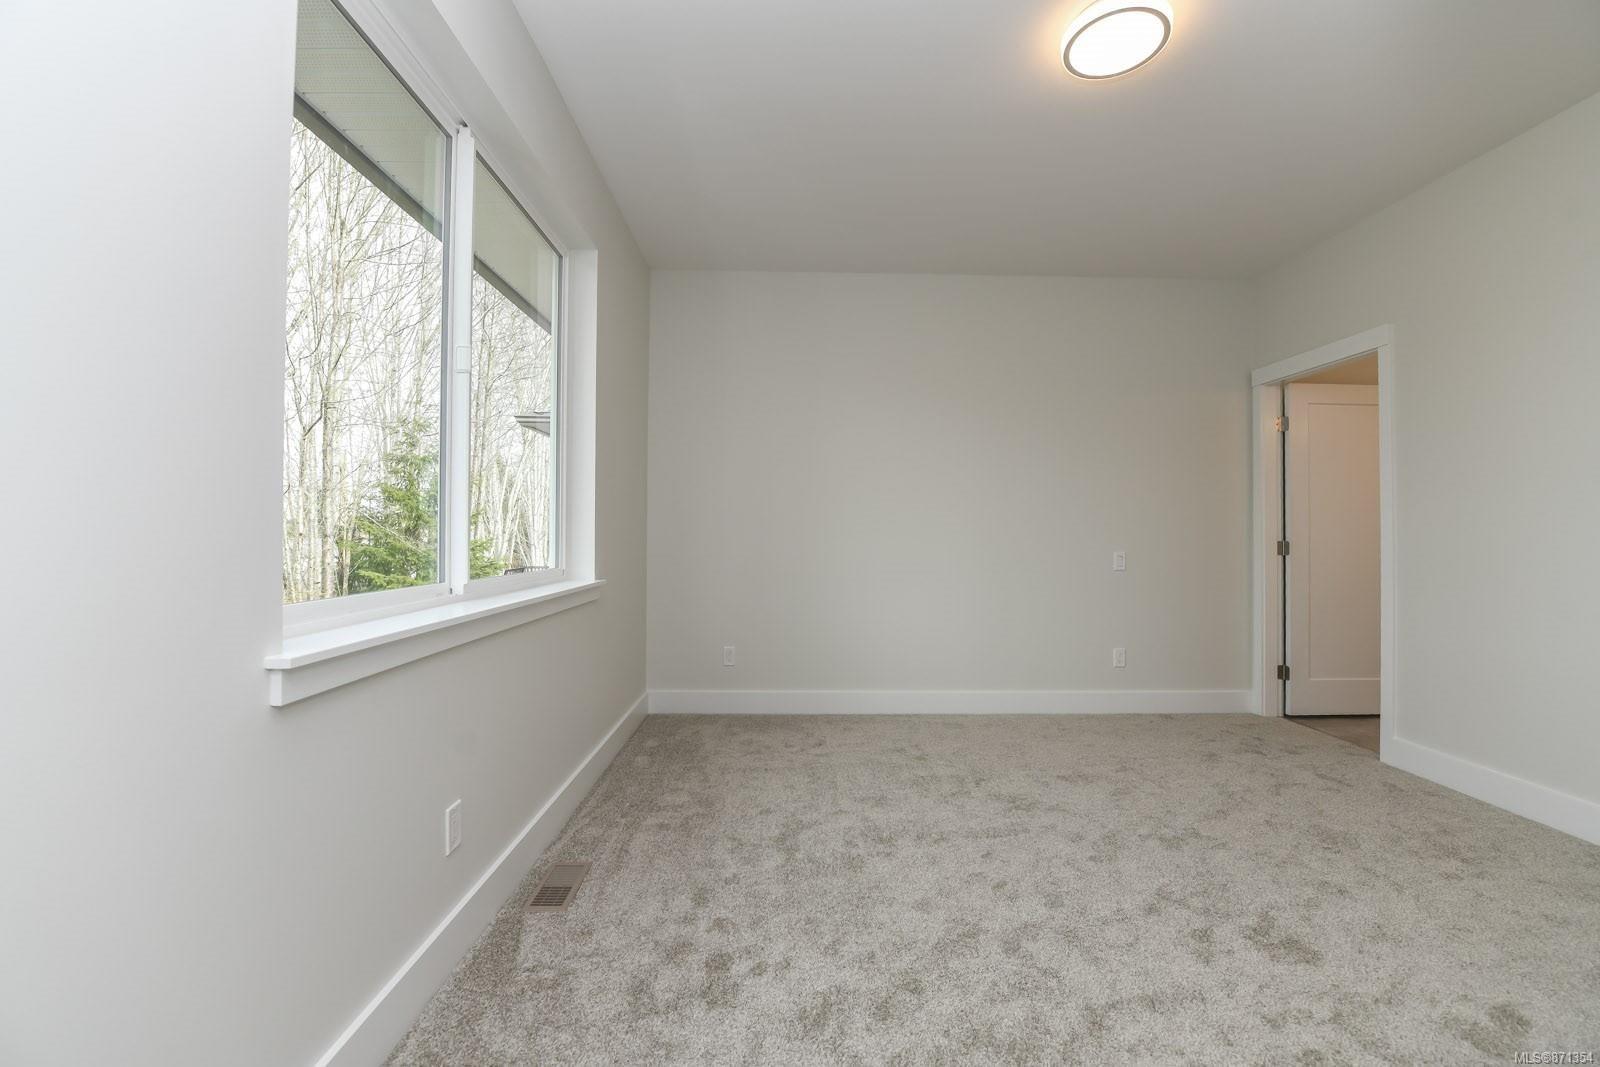 Photo 22: Photos: 68 Grayhawk Pl in : CV Courtenay City House for sale (Comox Valley)  : MLS®# 871354